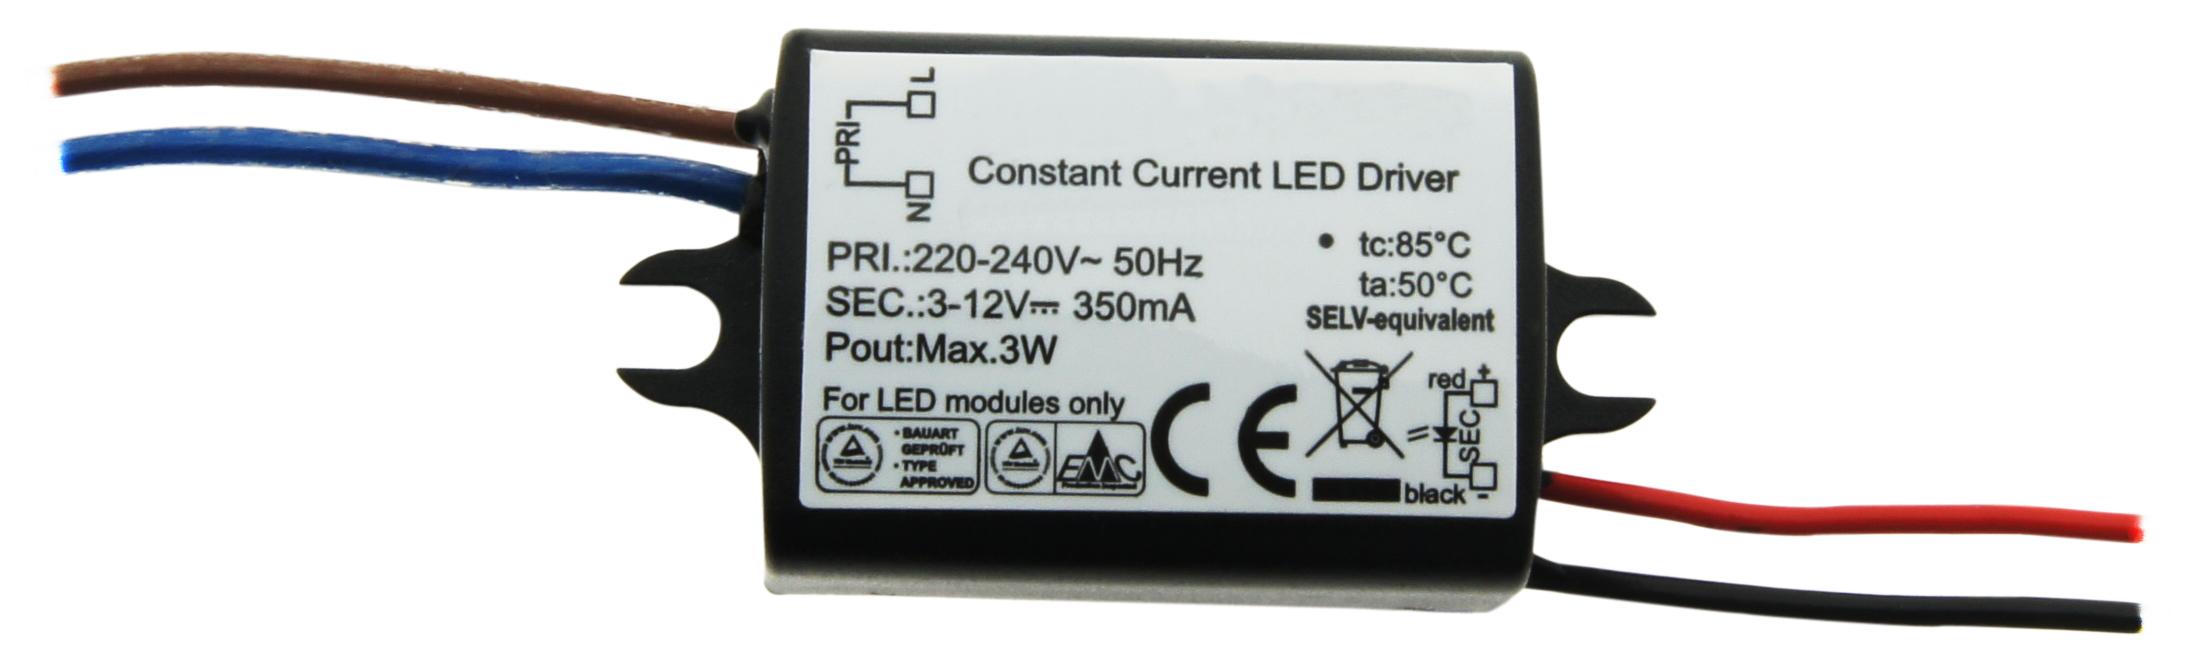 1 Stk LED Netzteil HW 3W/700mA, IP65 LINT403700